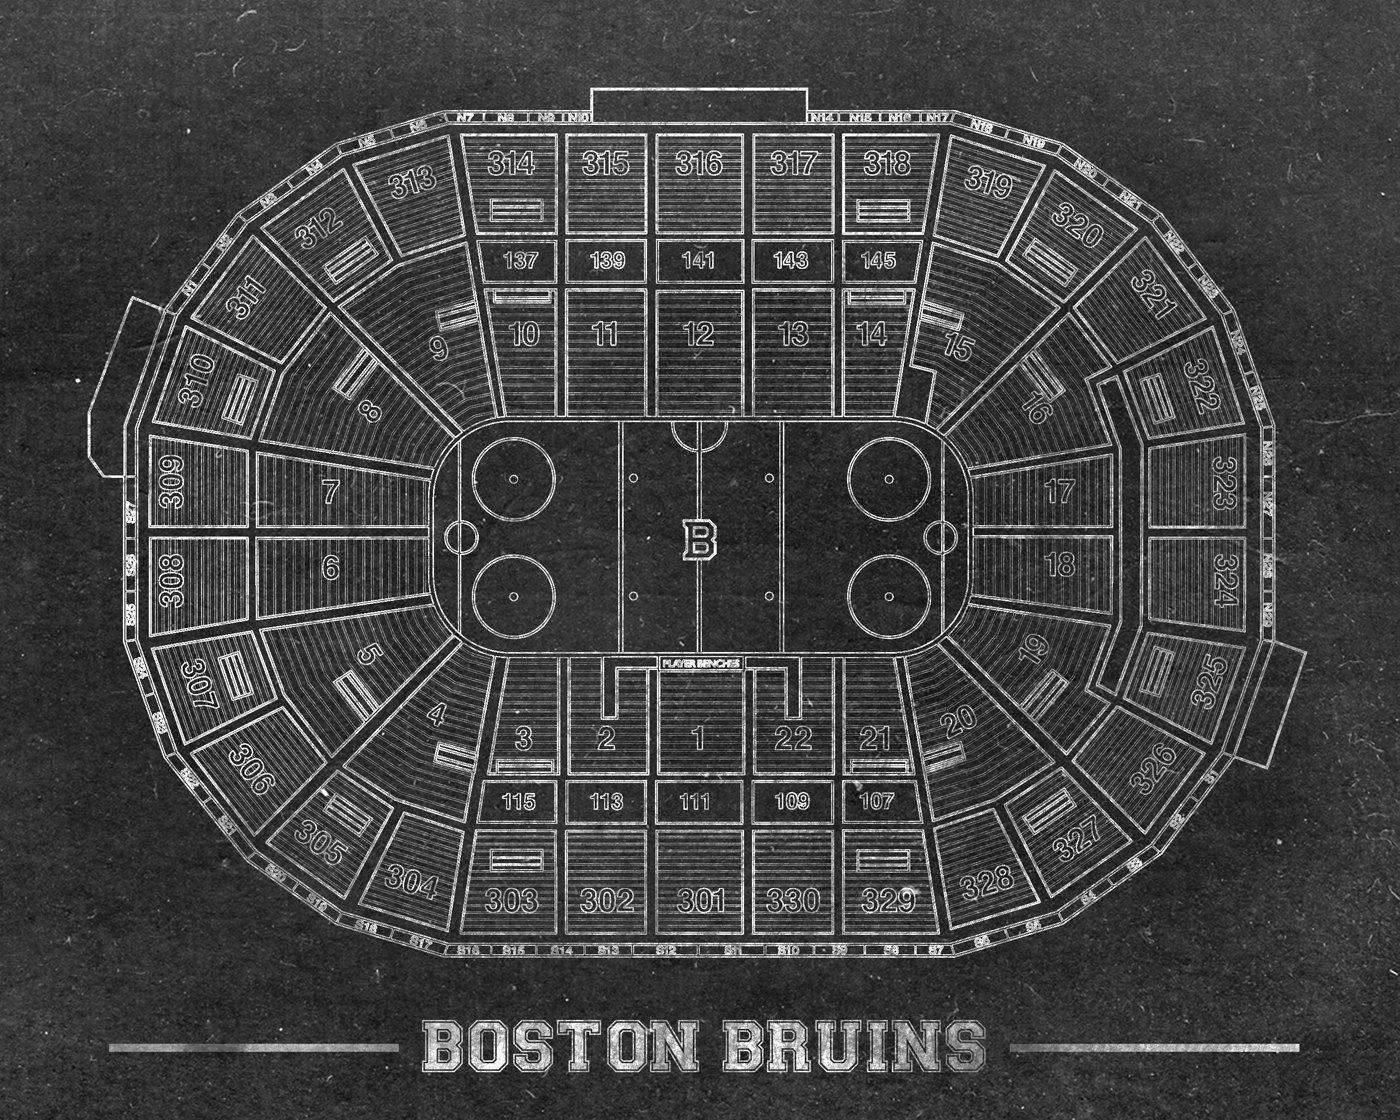 Vintage Print Of Td Garden Seating Chart Free Shipping Boston Bruins Hockey Blueprint Photo